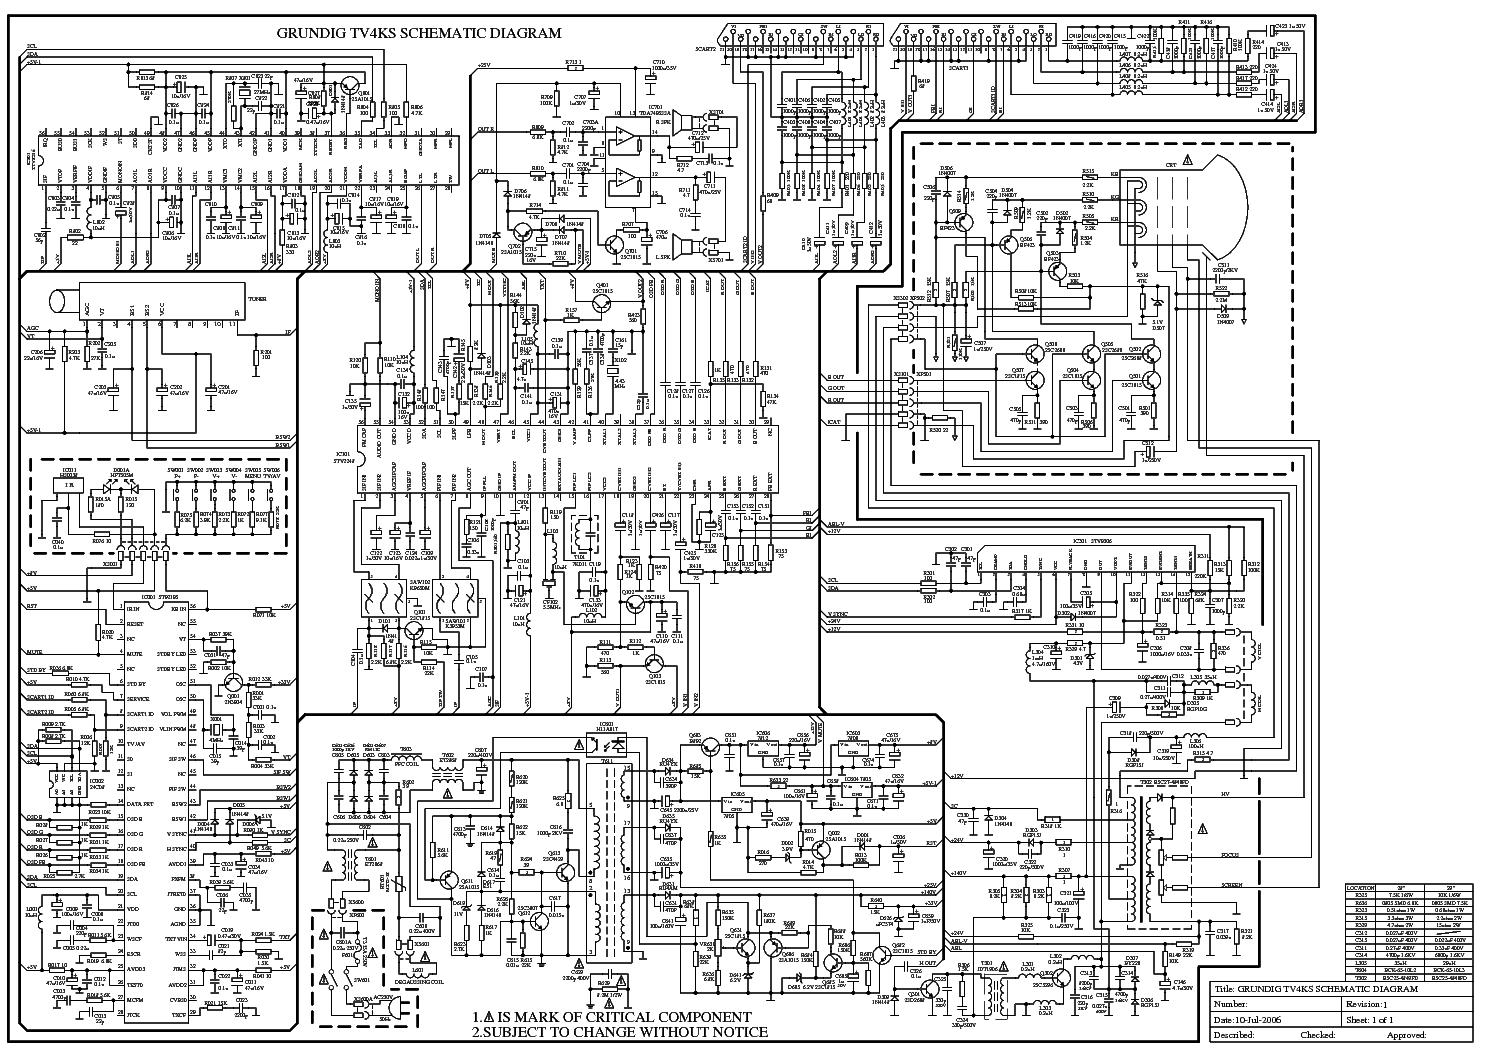 Grundig Tv4ks Service Manual Download  Schematics  Eeprom